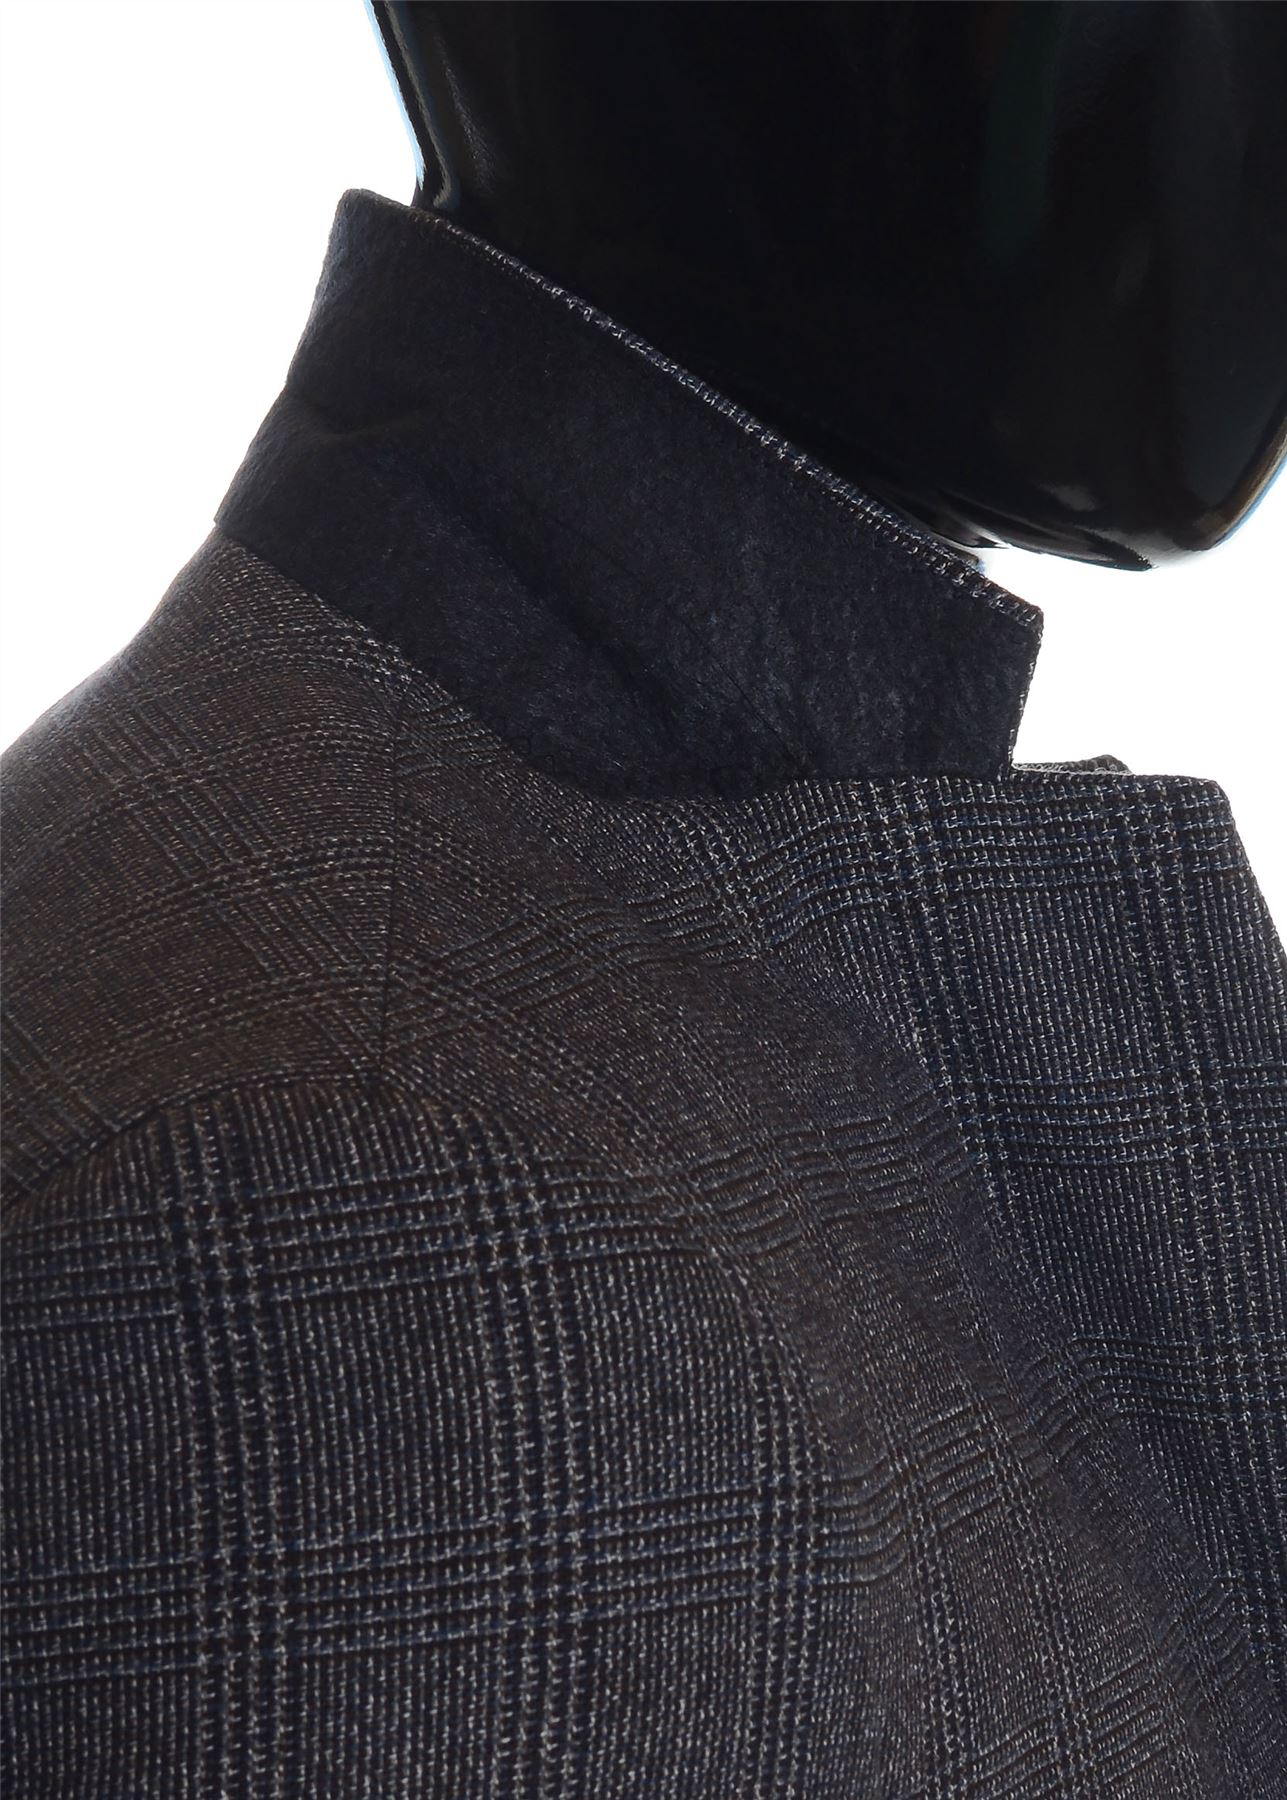 Men-039-s-Checkered-Coat-3-4-Long-Tweed-Cashmere-Wool-Trendy-Formal-Winter-Overcoat thumbnail 27